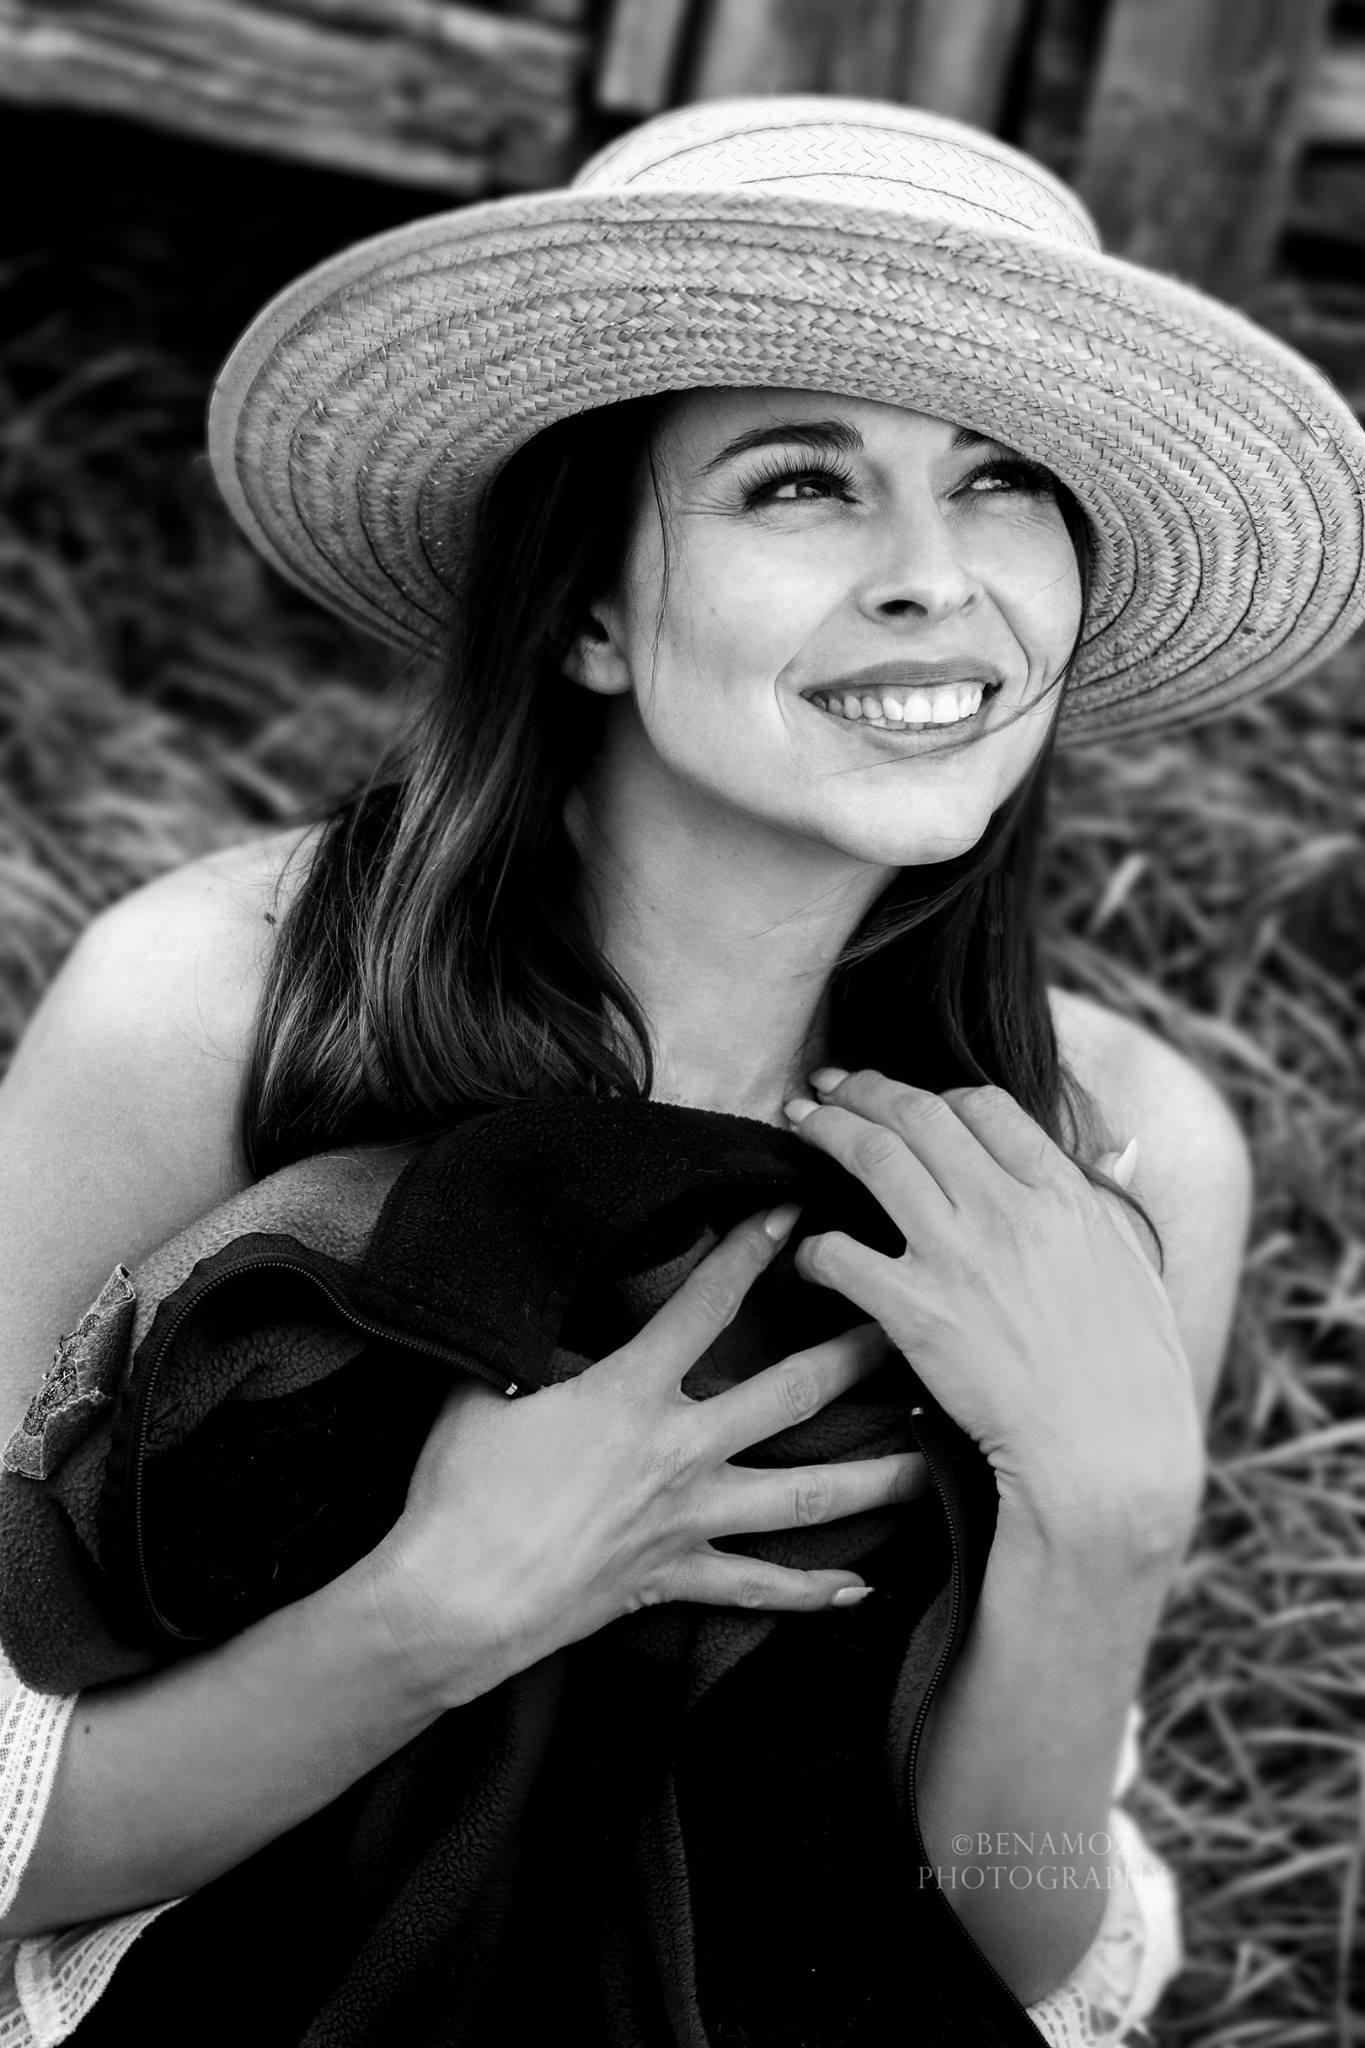 Benamoz Boudoir, black and white Jackie o style image